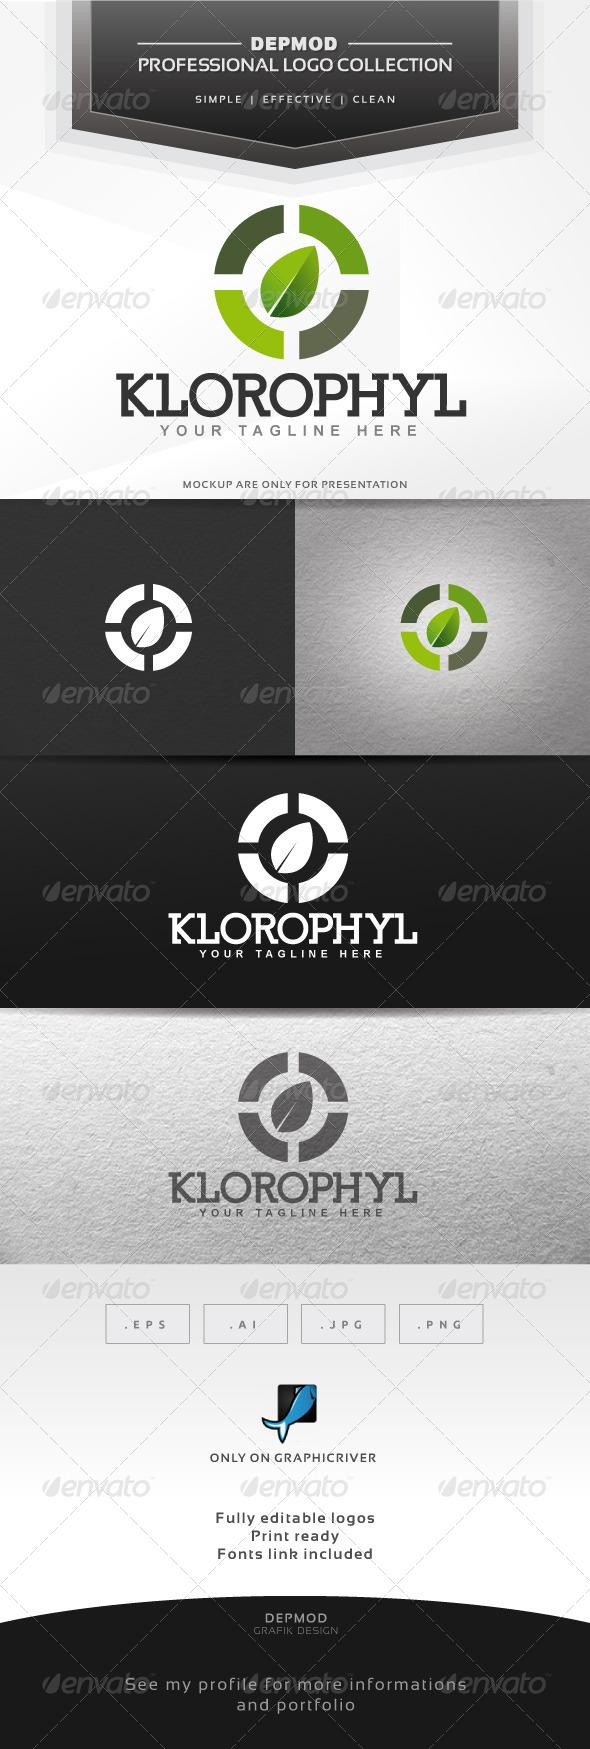 GraphicRiver KIorophyl Logo 6396992